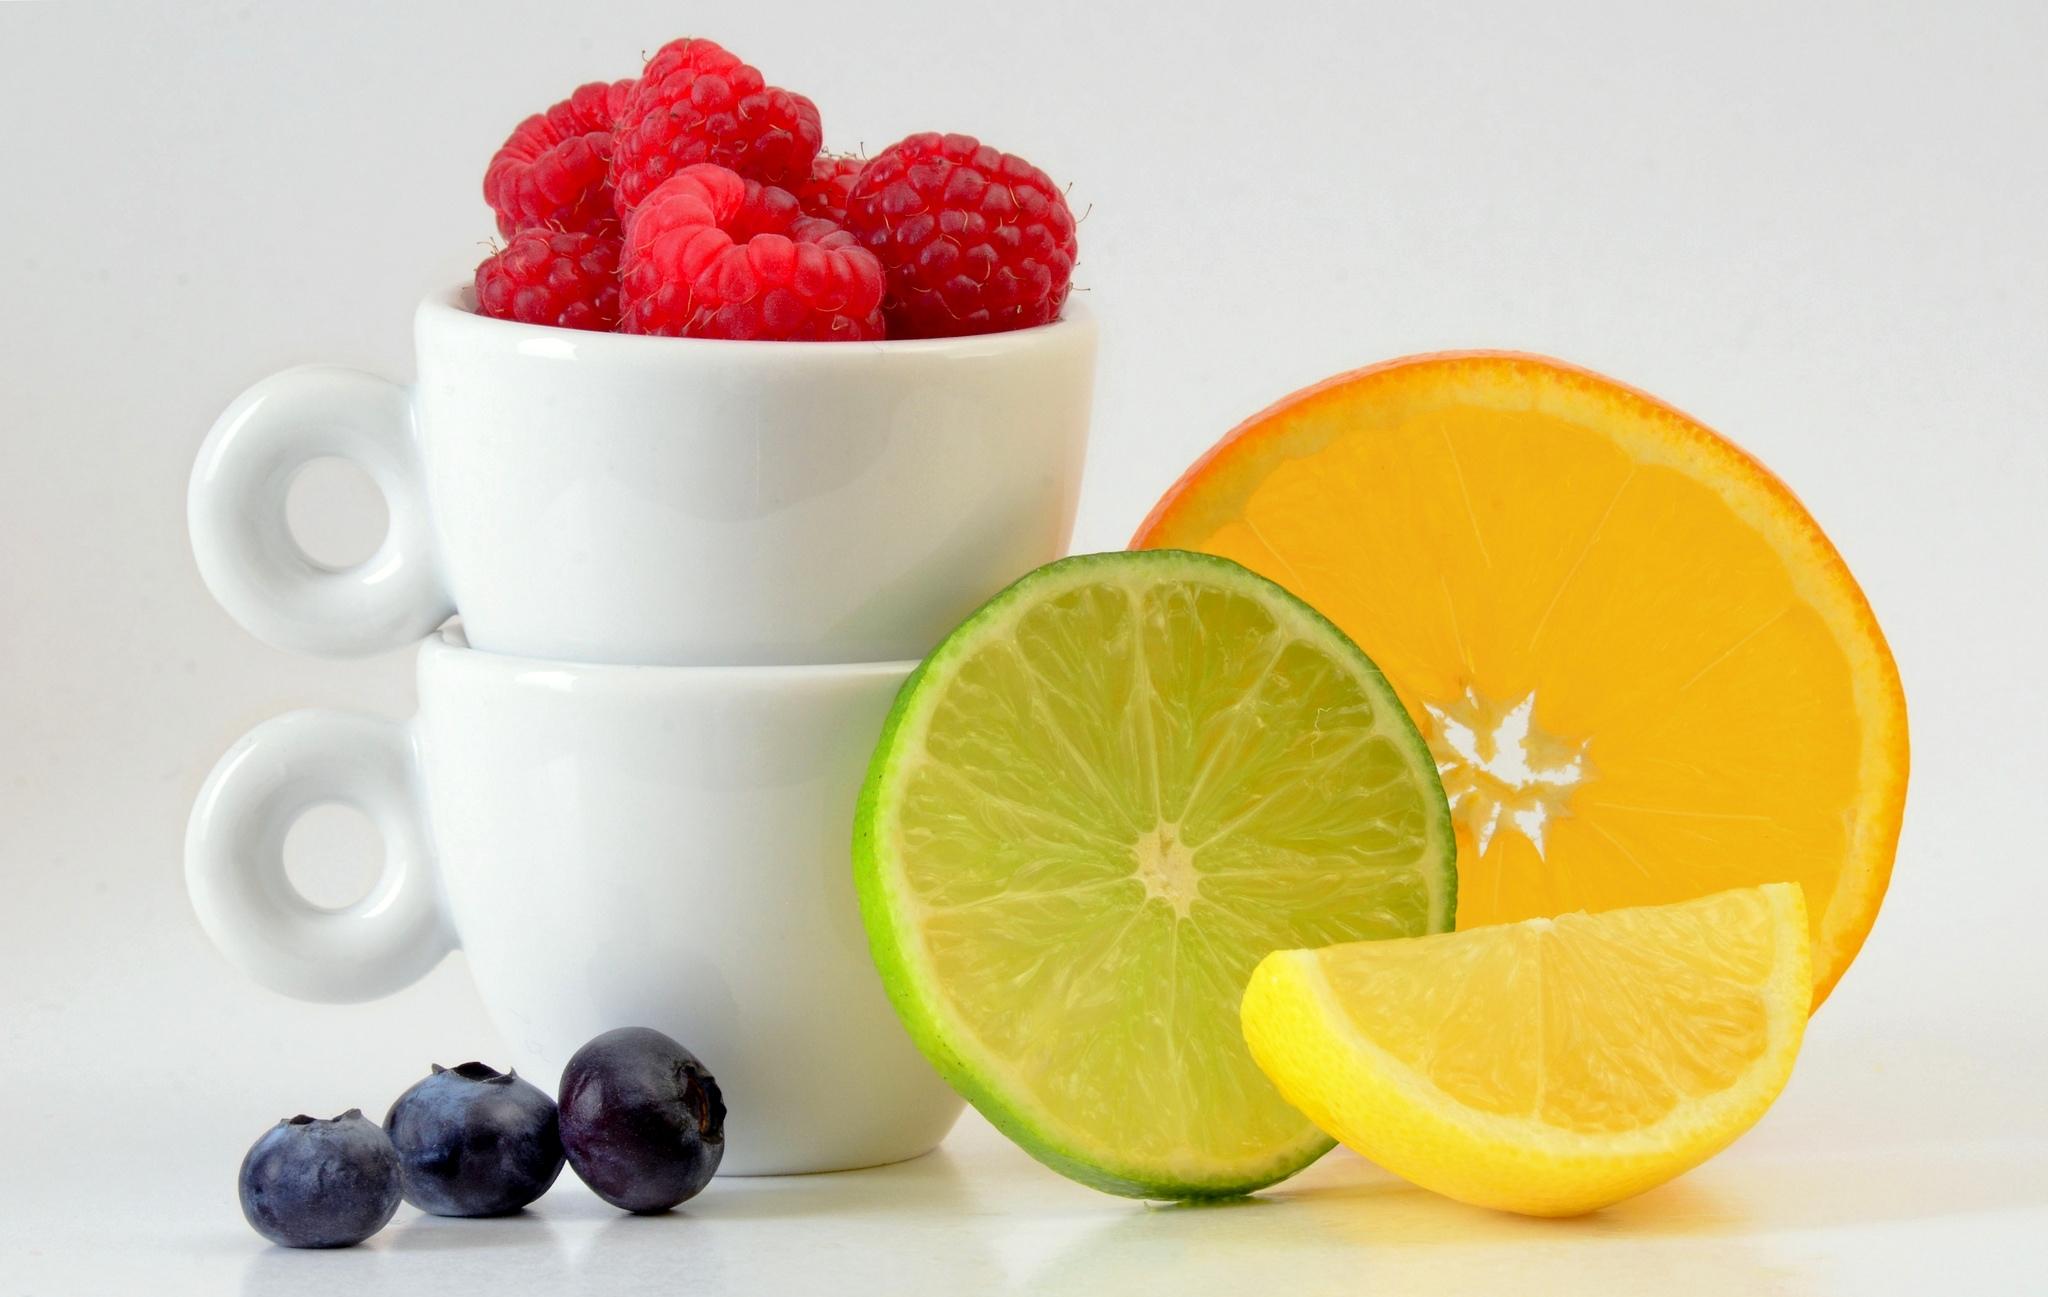 108345 download wallpaper Food, Raspberry, Lime, Bilberries, Berries, Lemon, Citrus, Citruses screensavers and pictures for free